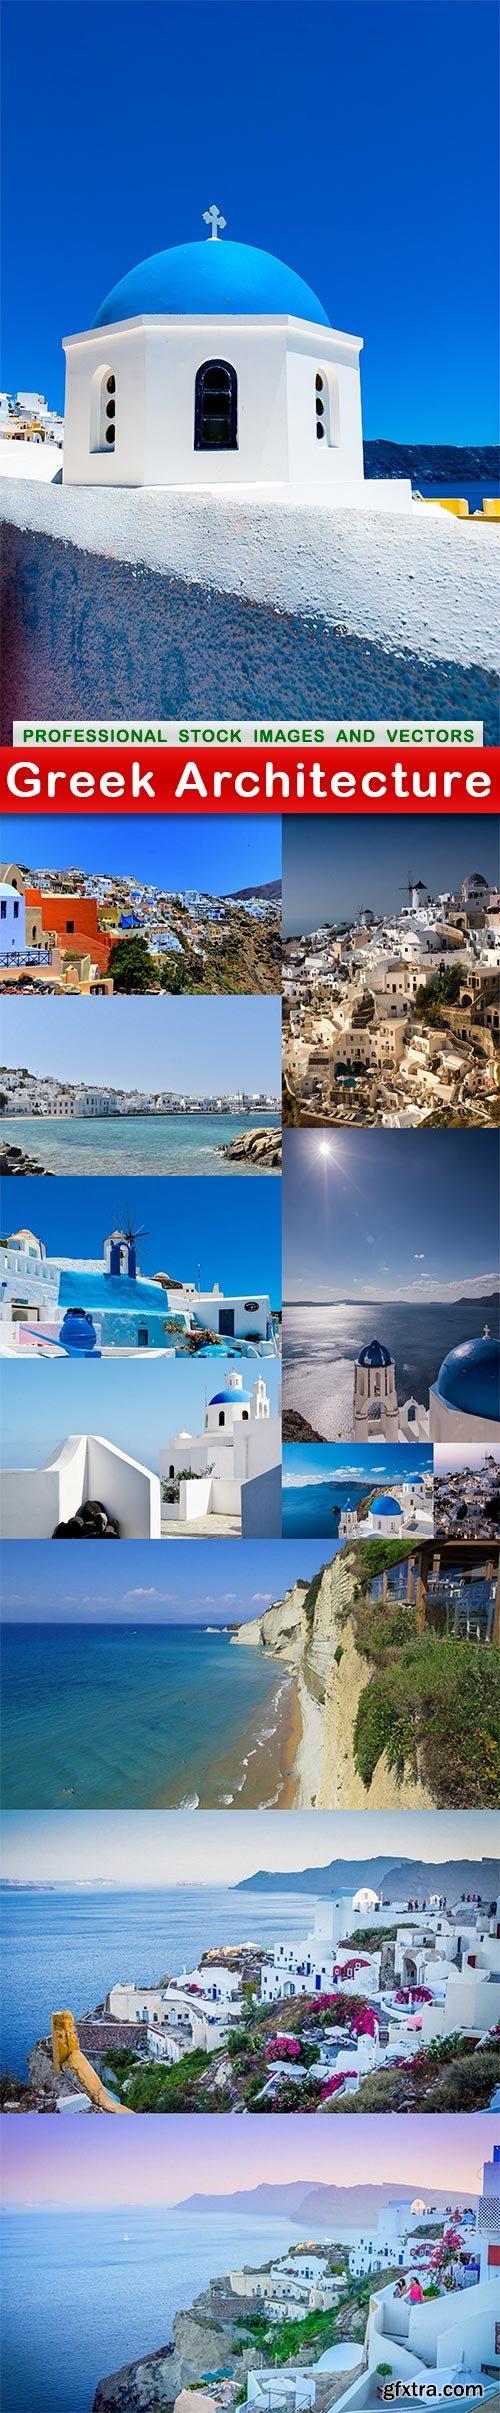 Greek Architecture - 12 UHQ JPEG